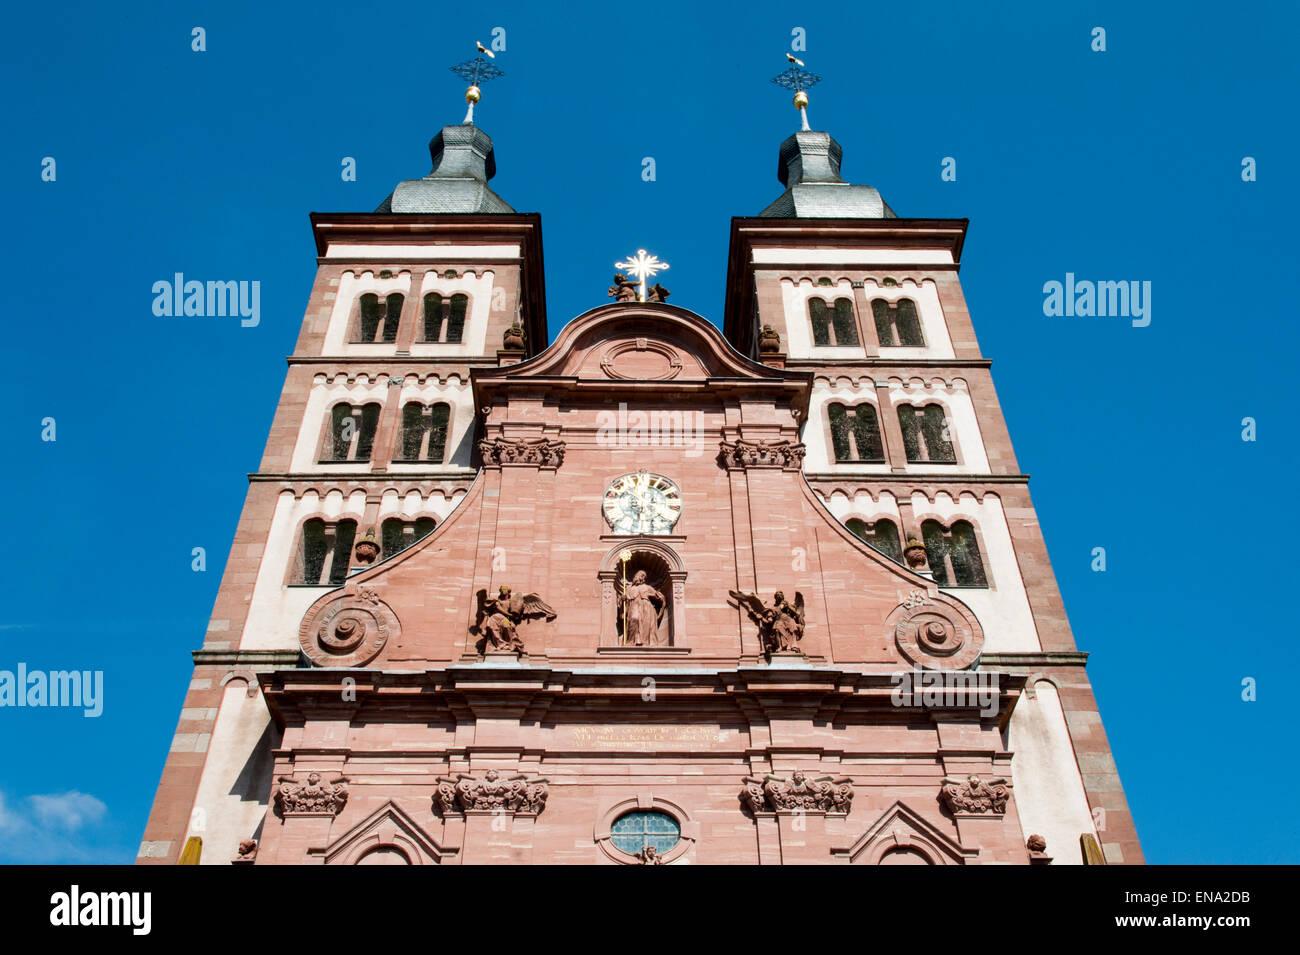 Klosterkirche Amorbach, Odenwald, Bayern, Deutschland | Amorbach monastery church, Odenwald, Bavaria, Germany - Stock Image